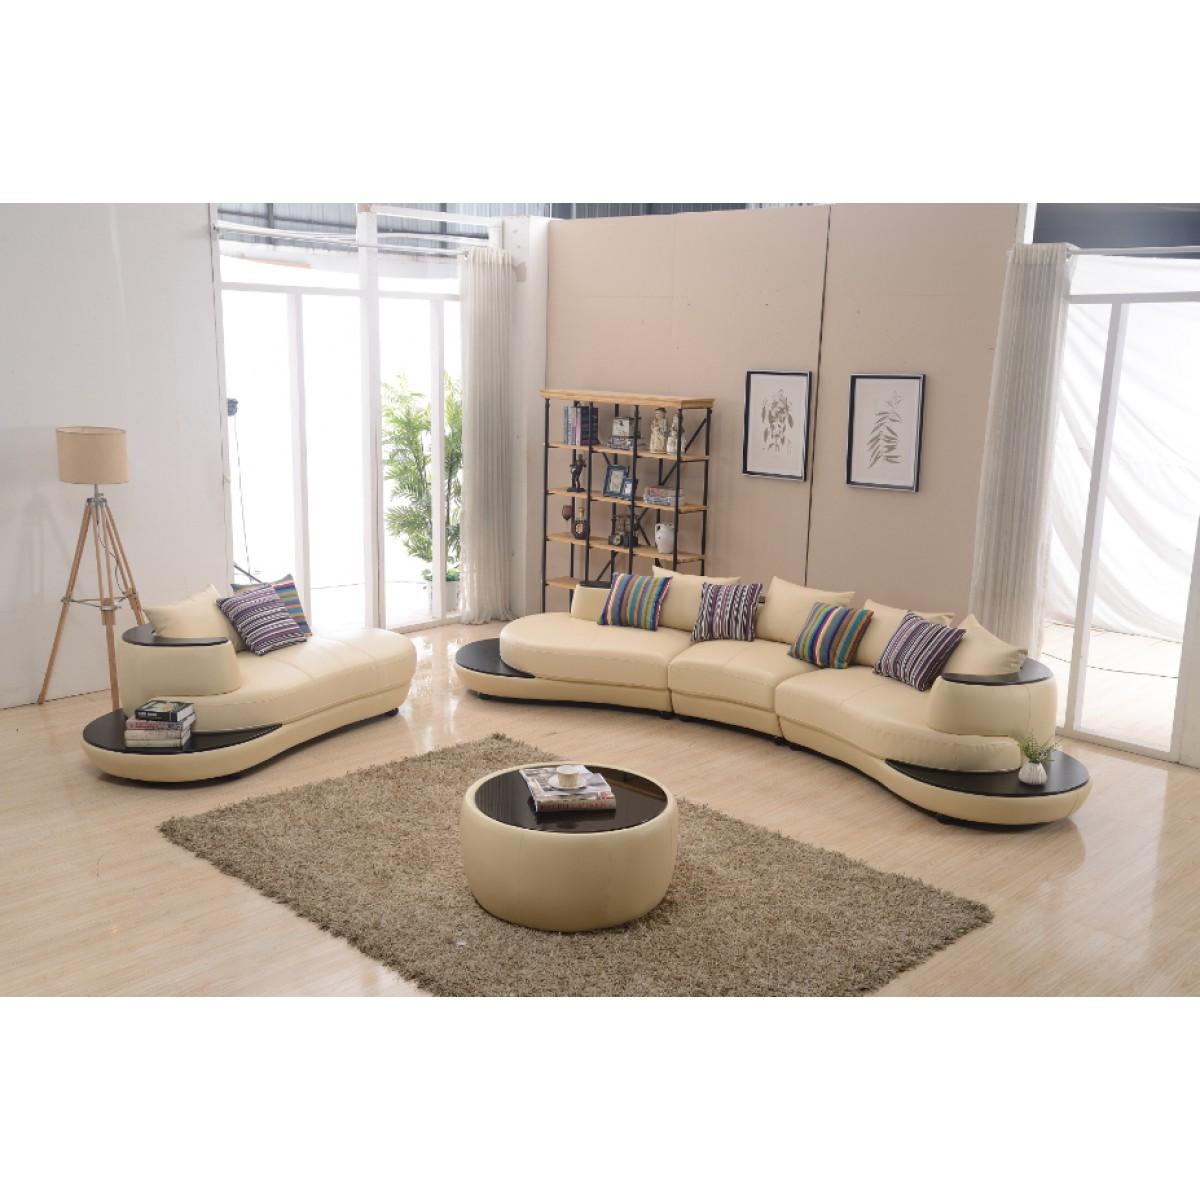 canap demi lune en cuir irma canap s. Black Bedroom Furniture Sets. Home Design Ideas